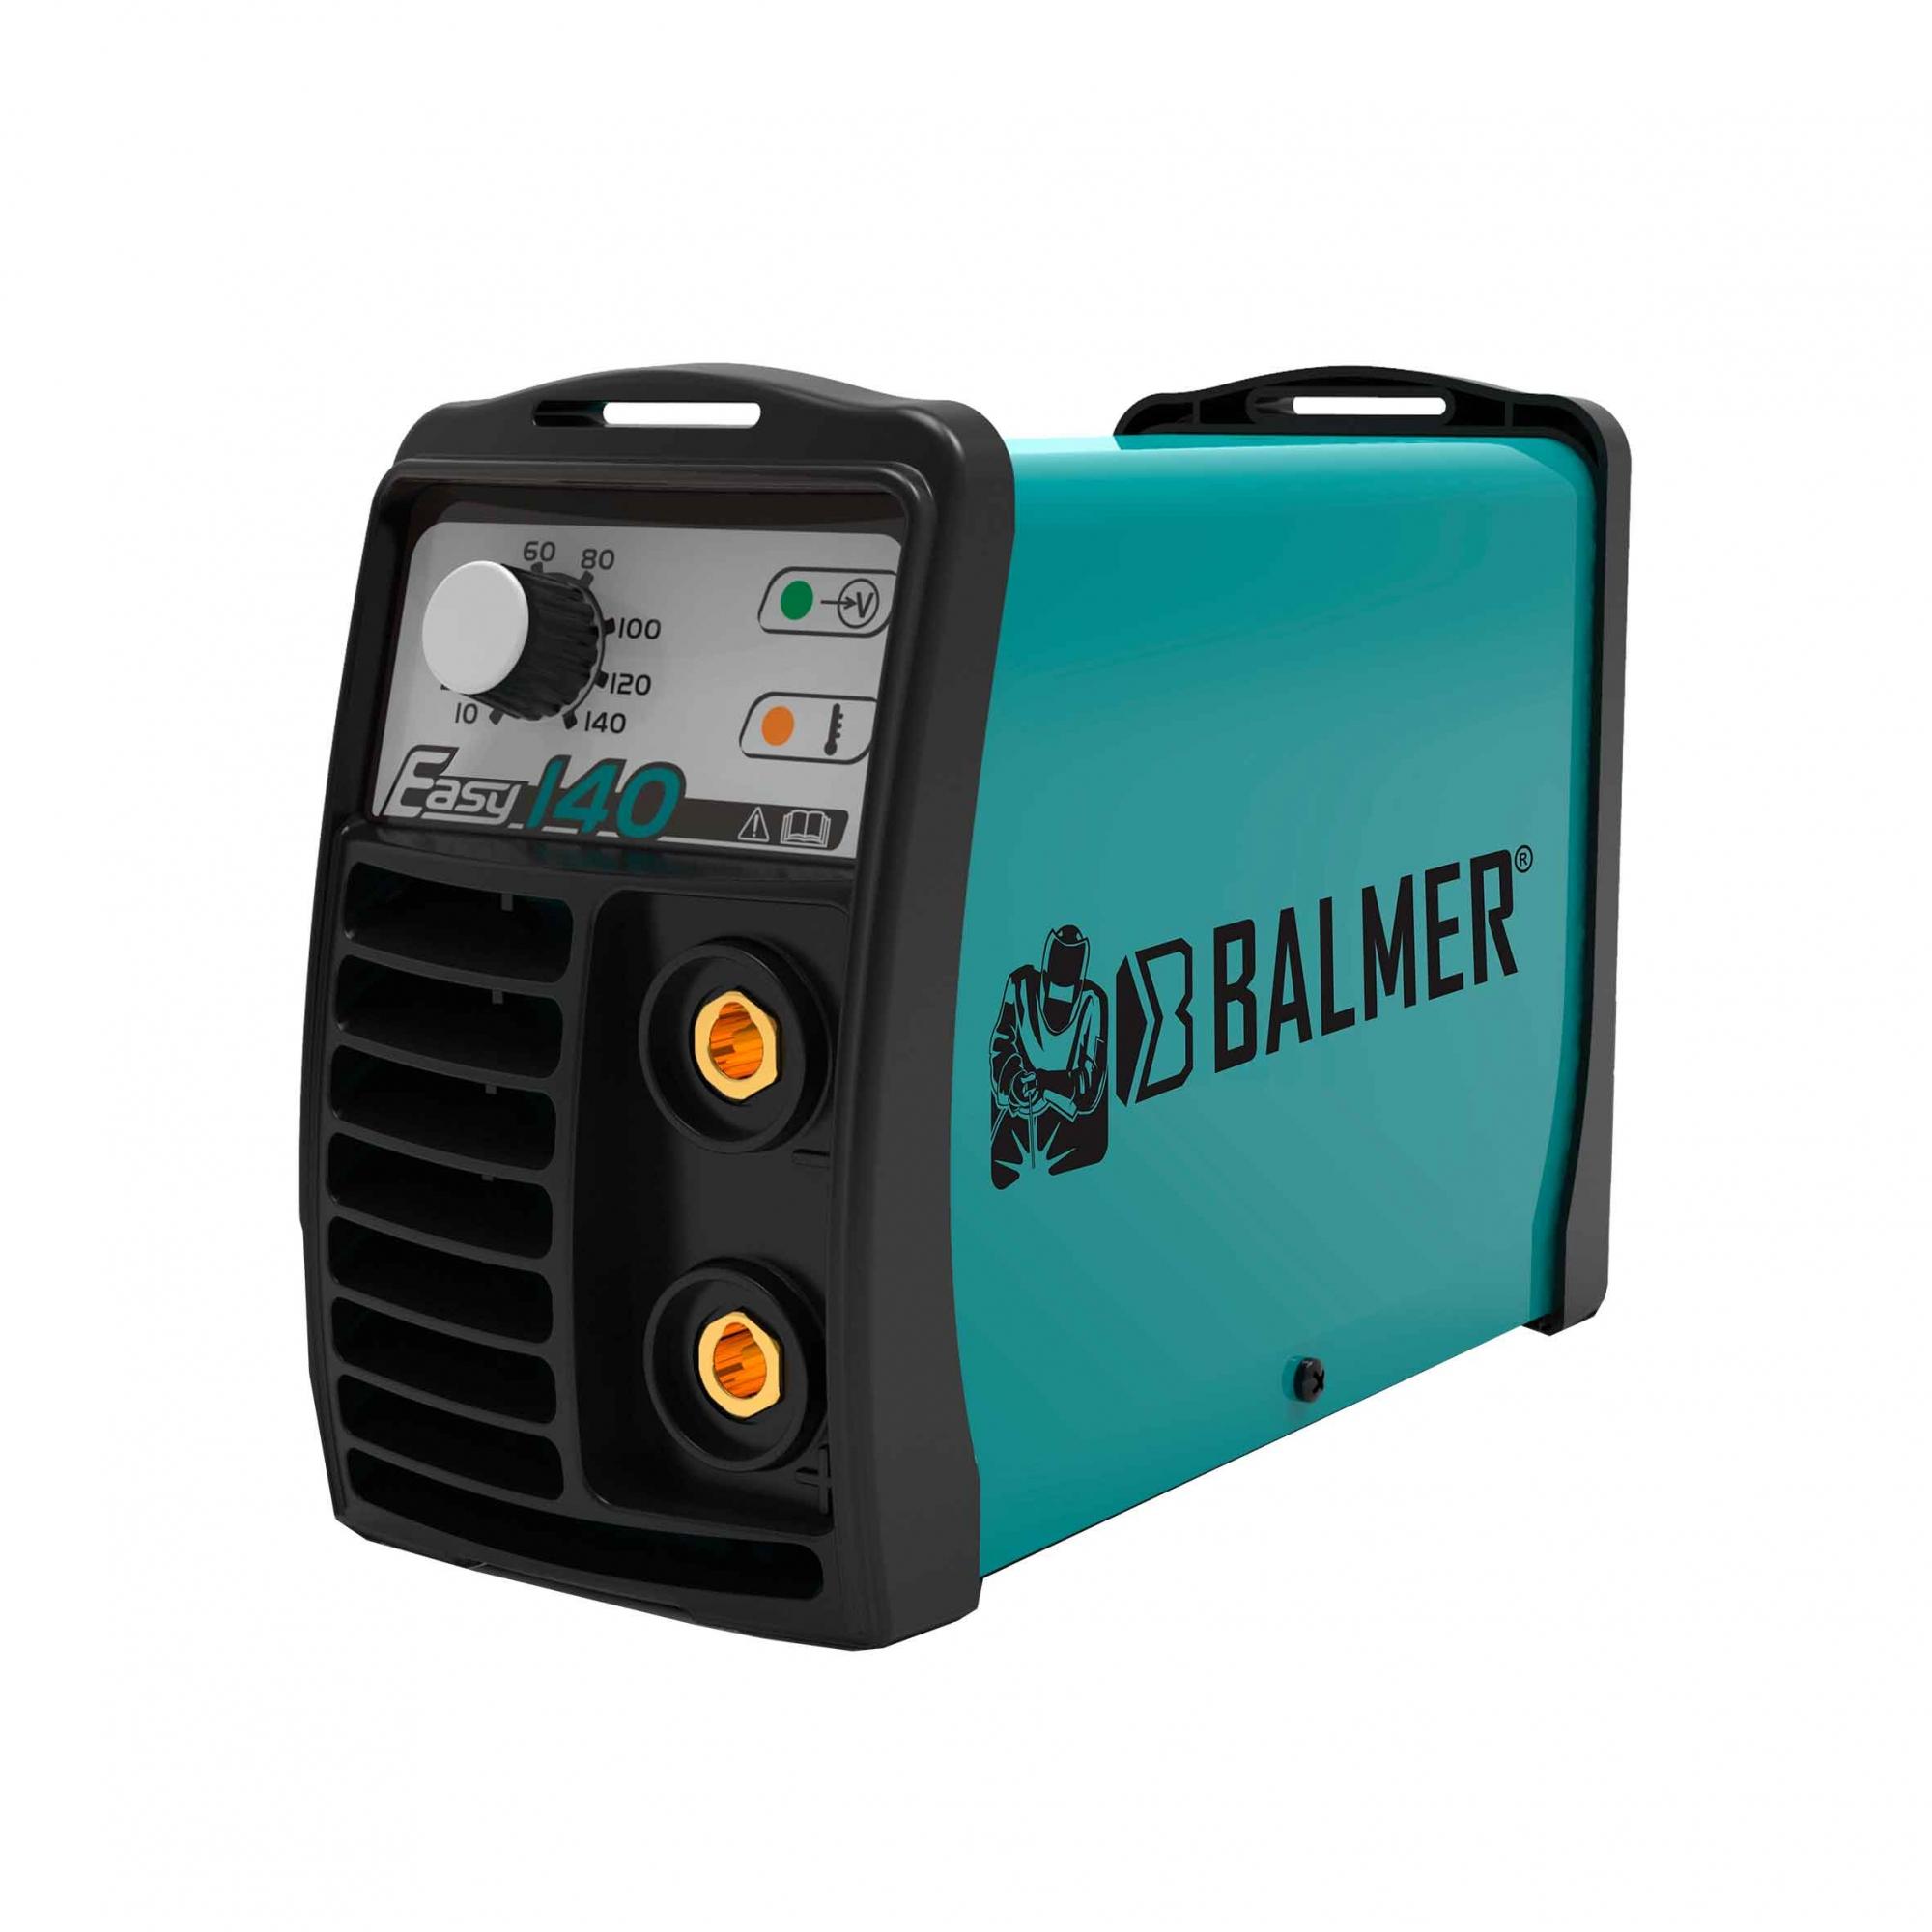 Inversora de Solda 140A 220V EASY 140 - Balmer